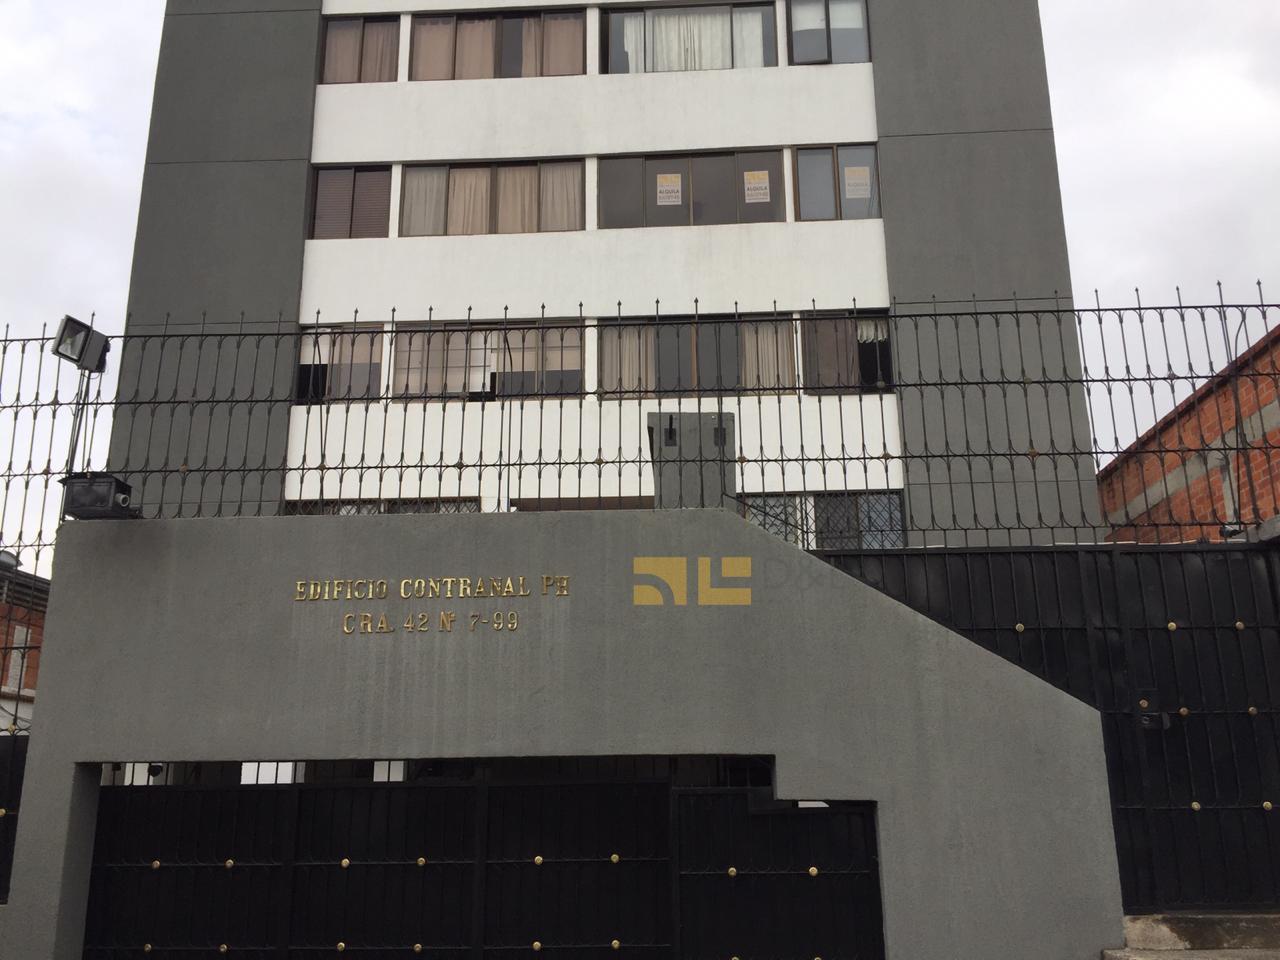 Cra 42 # 7-99, Edificio Contranal, apto 401